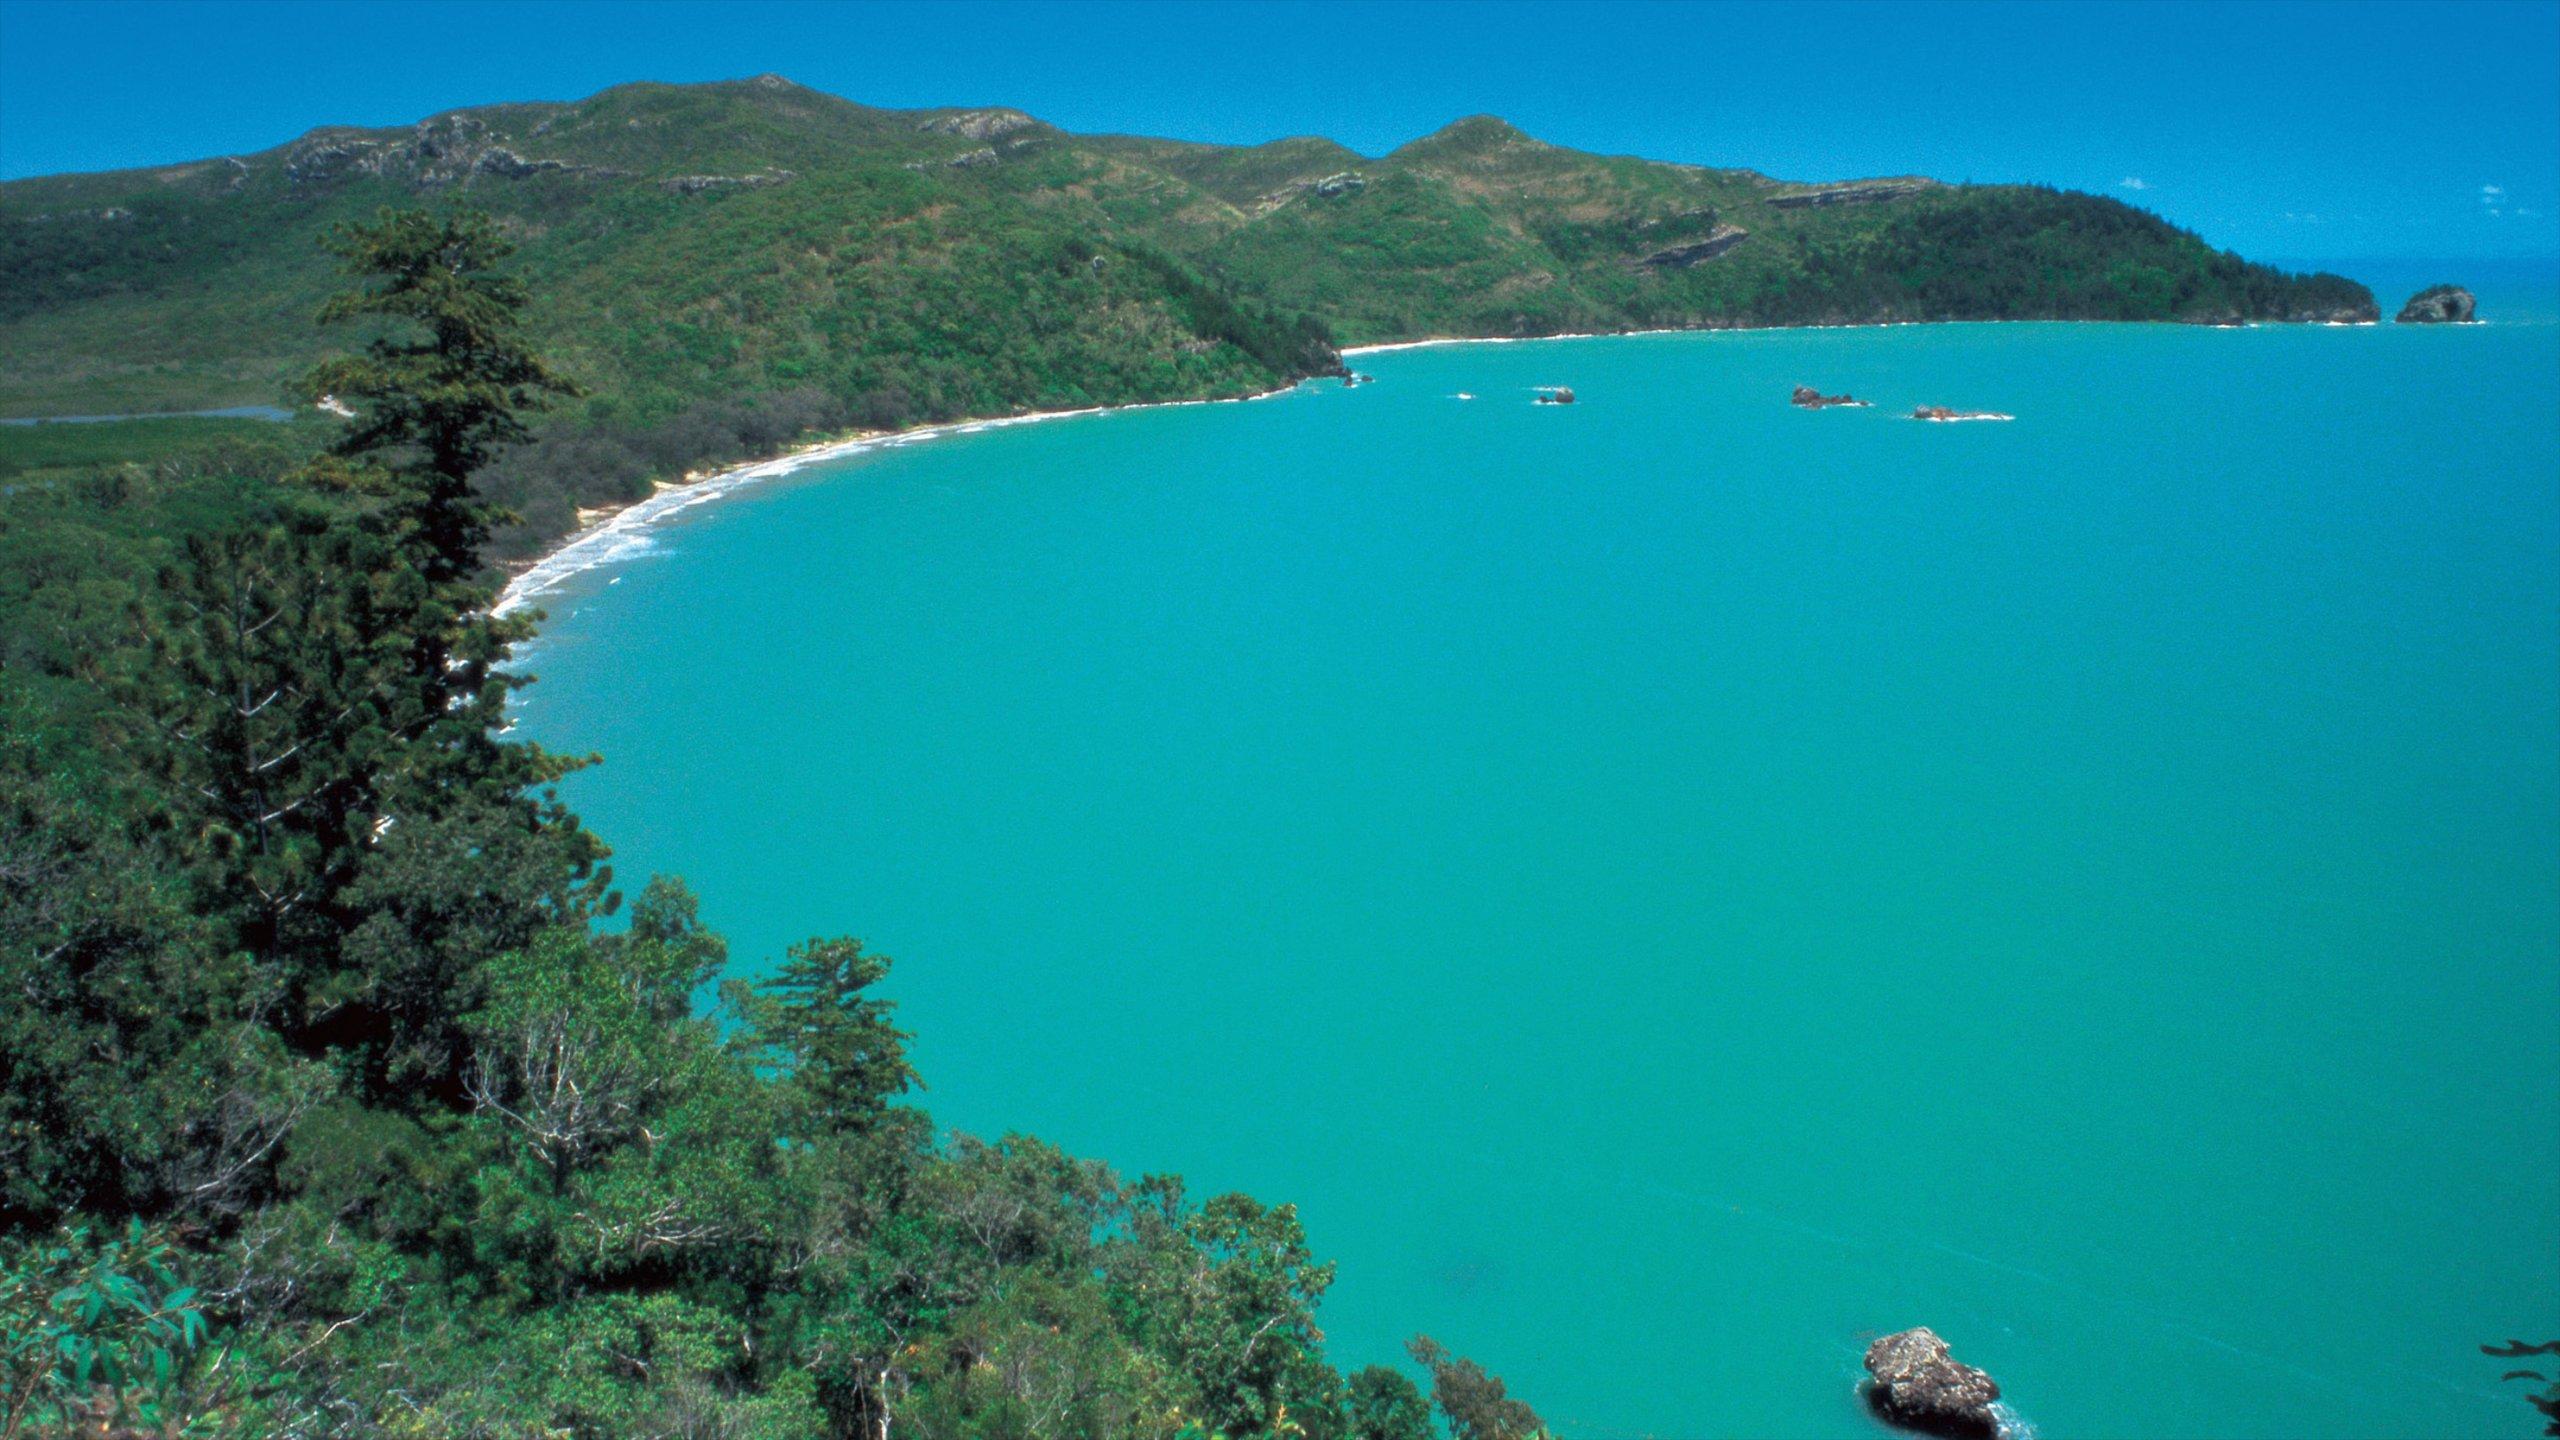 Mackay Region, Queensland, Australia